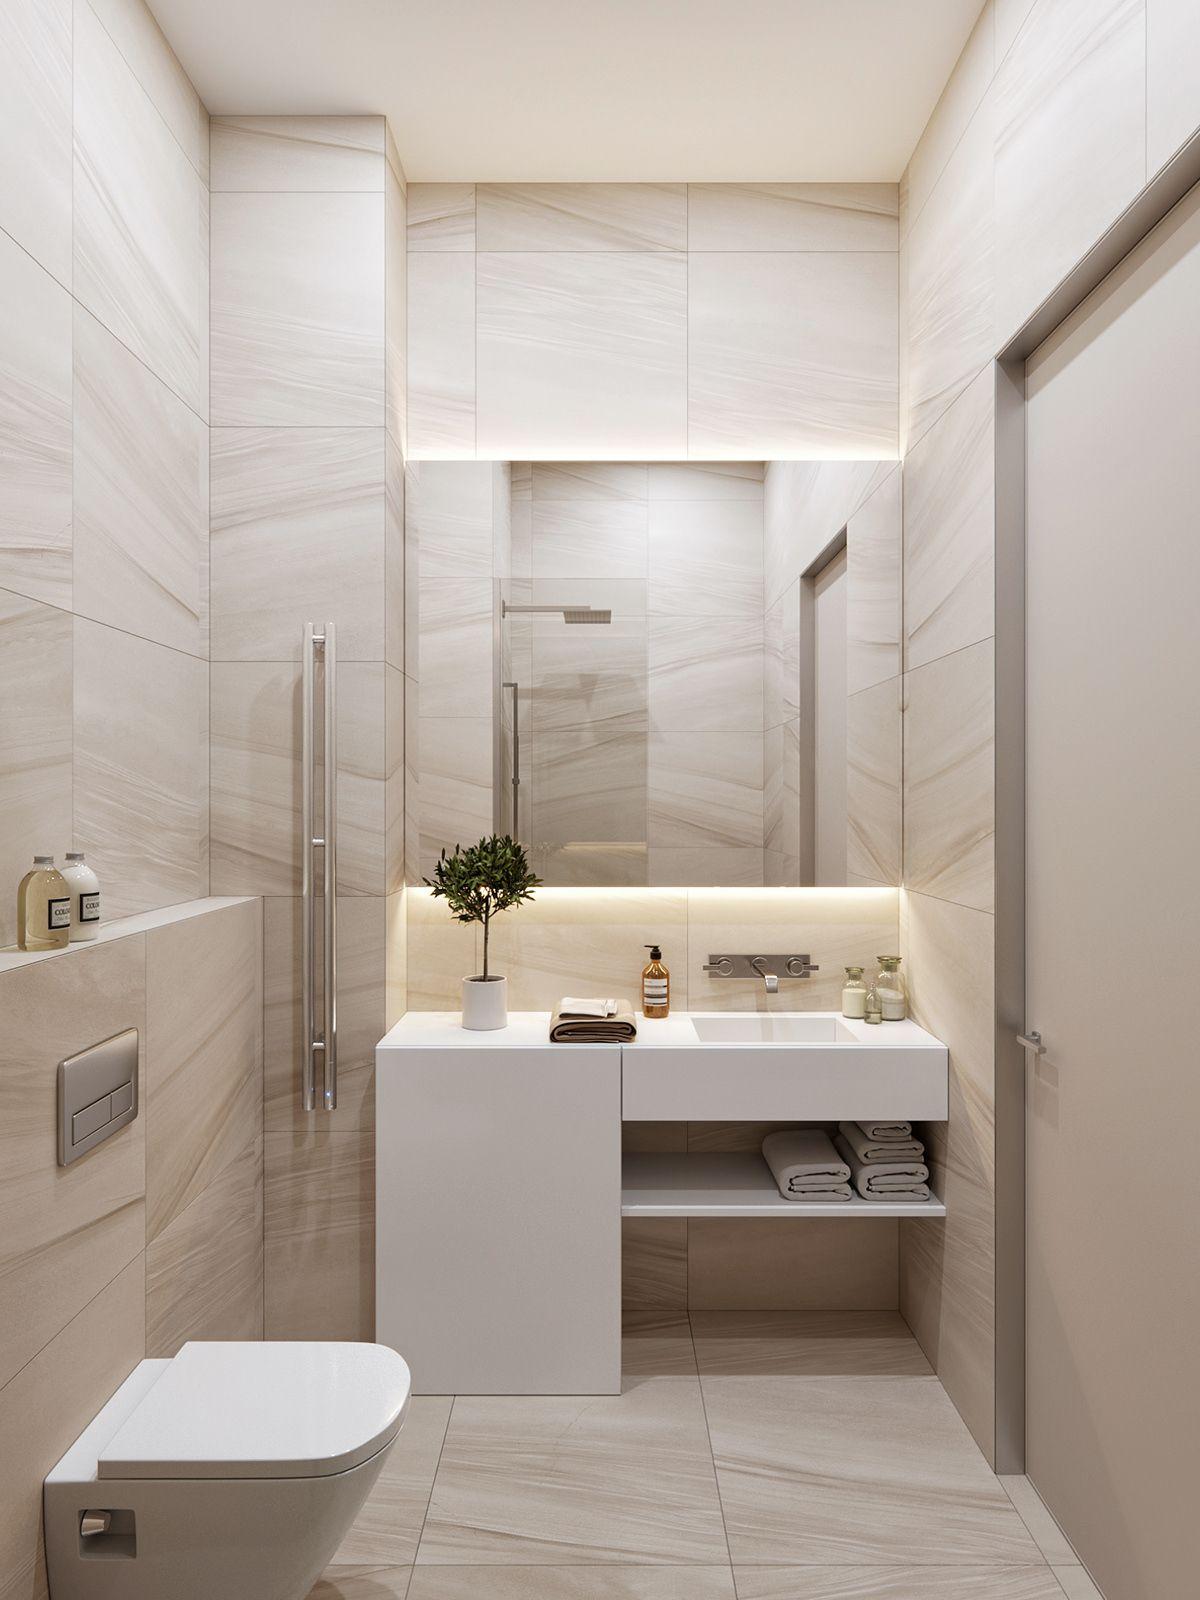 Une Kitchenette Peut Etre Design Bathroom Design Small Bathroom